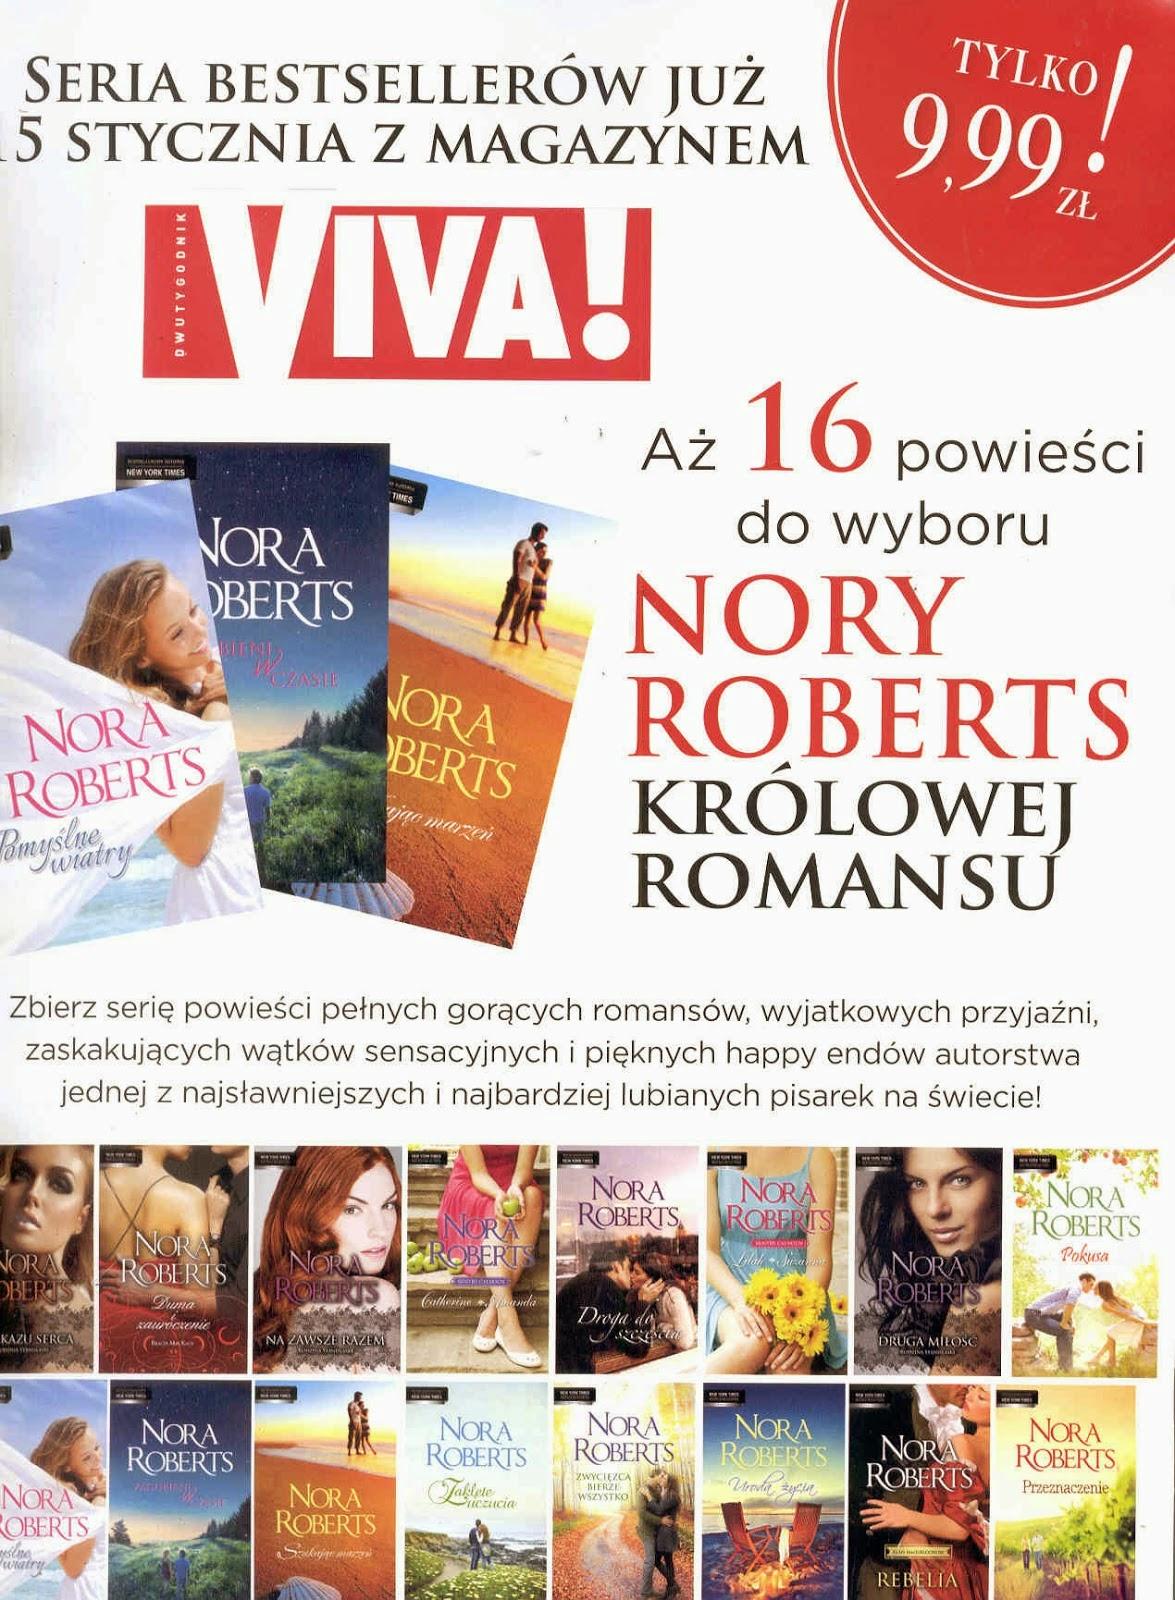 "16 książek Nory Roberts z ""Vivą"", każda za 9,99 zł!"